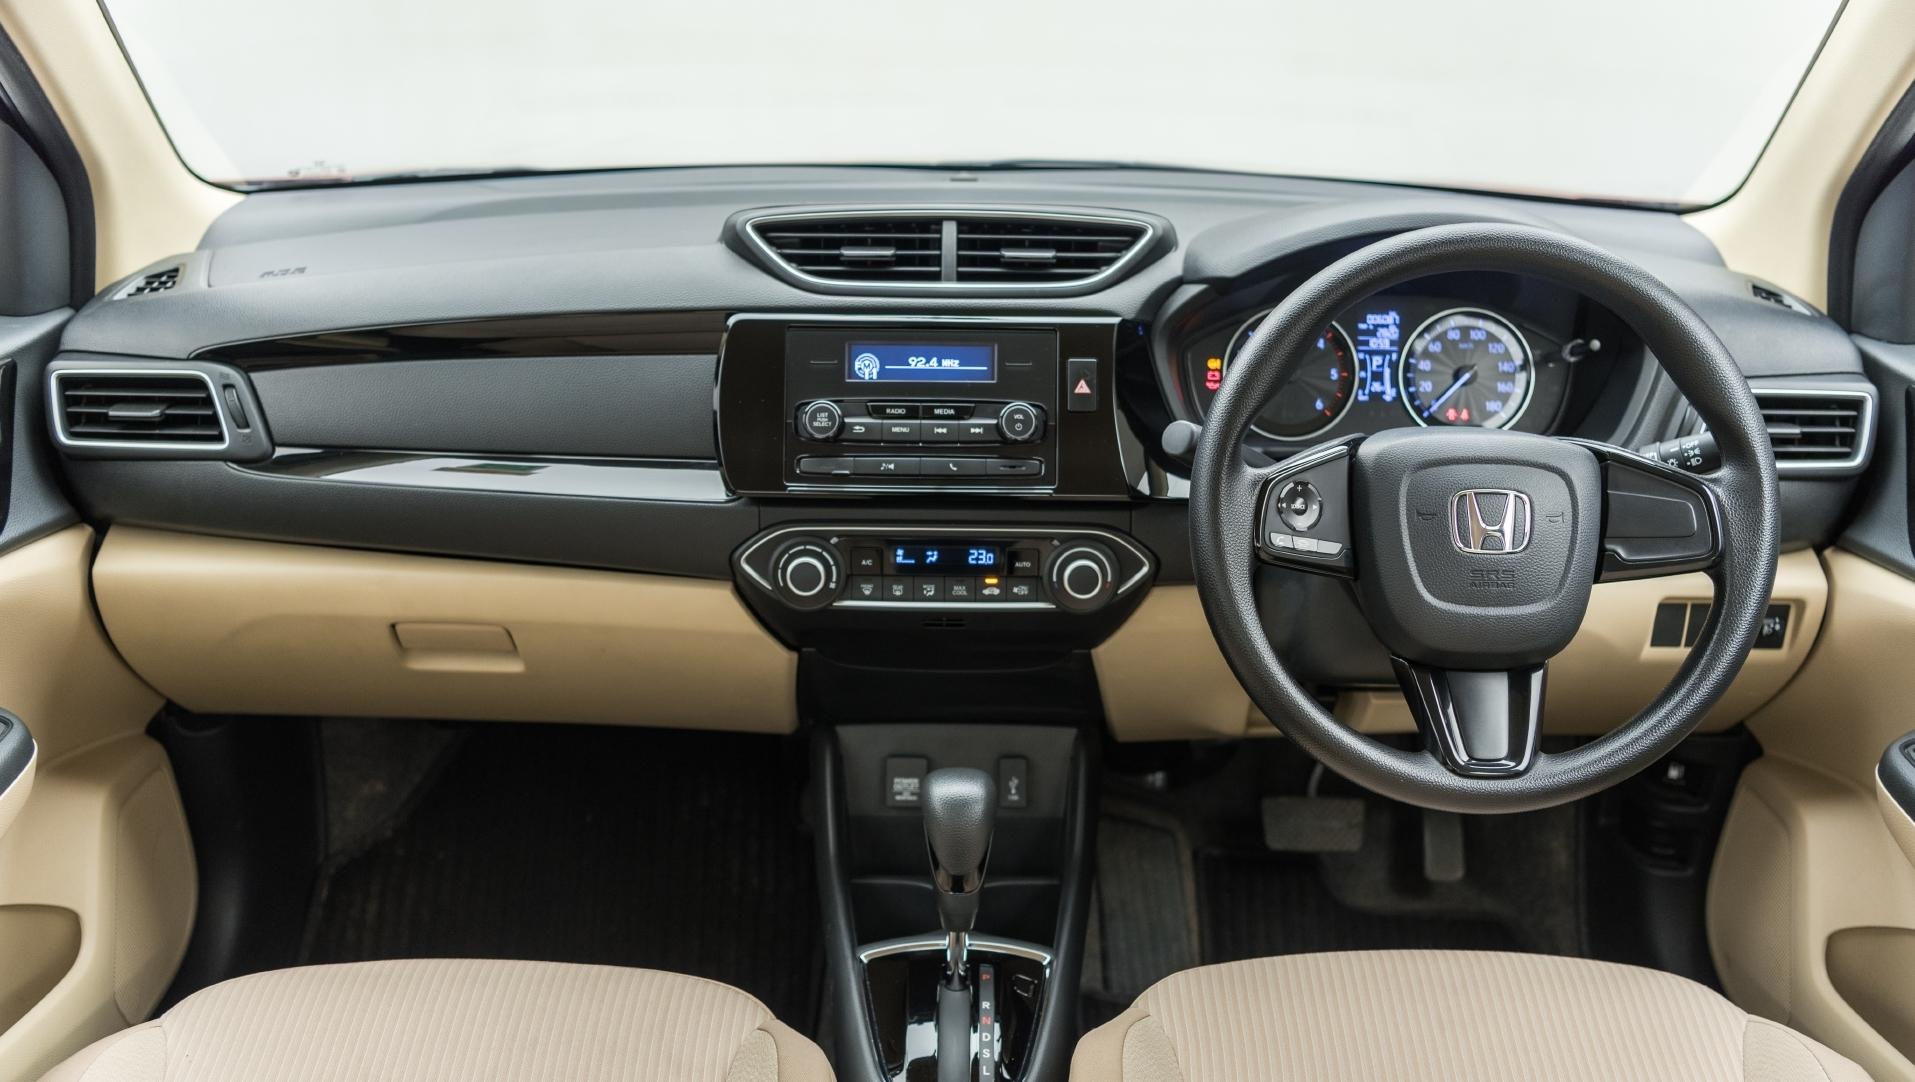 amaze-interior-dashboard